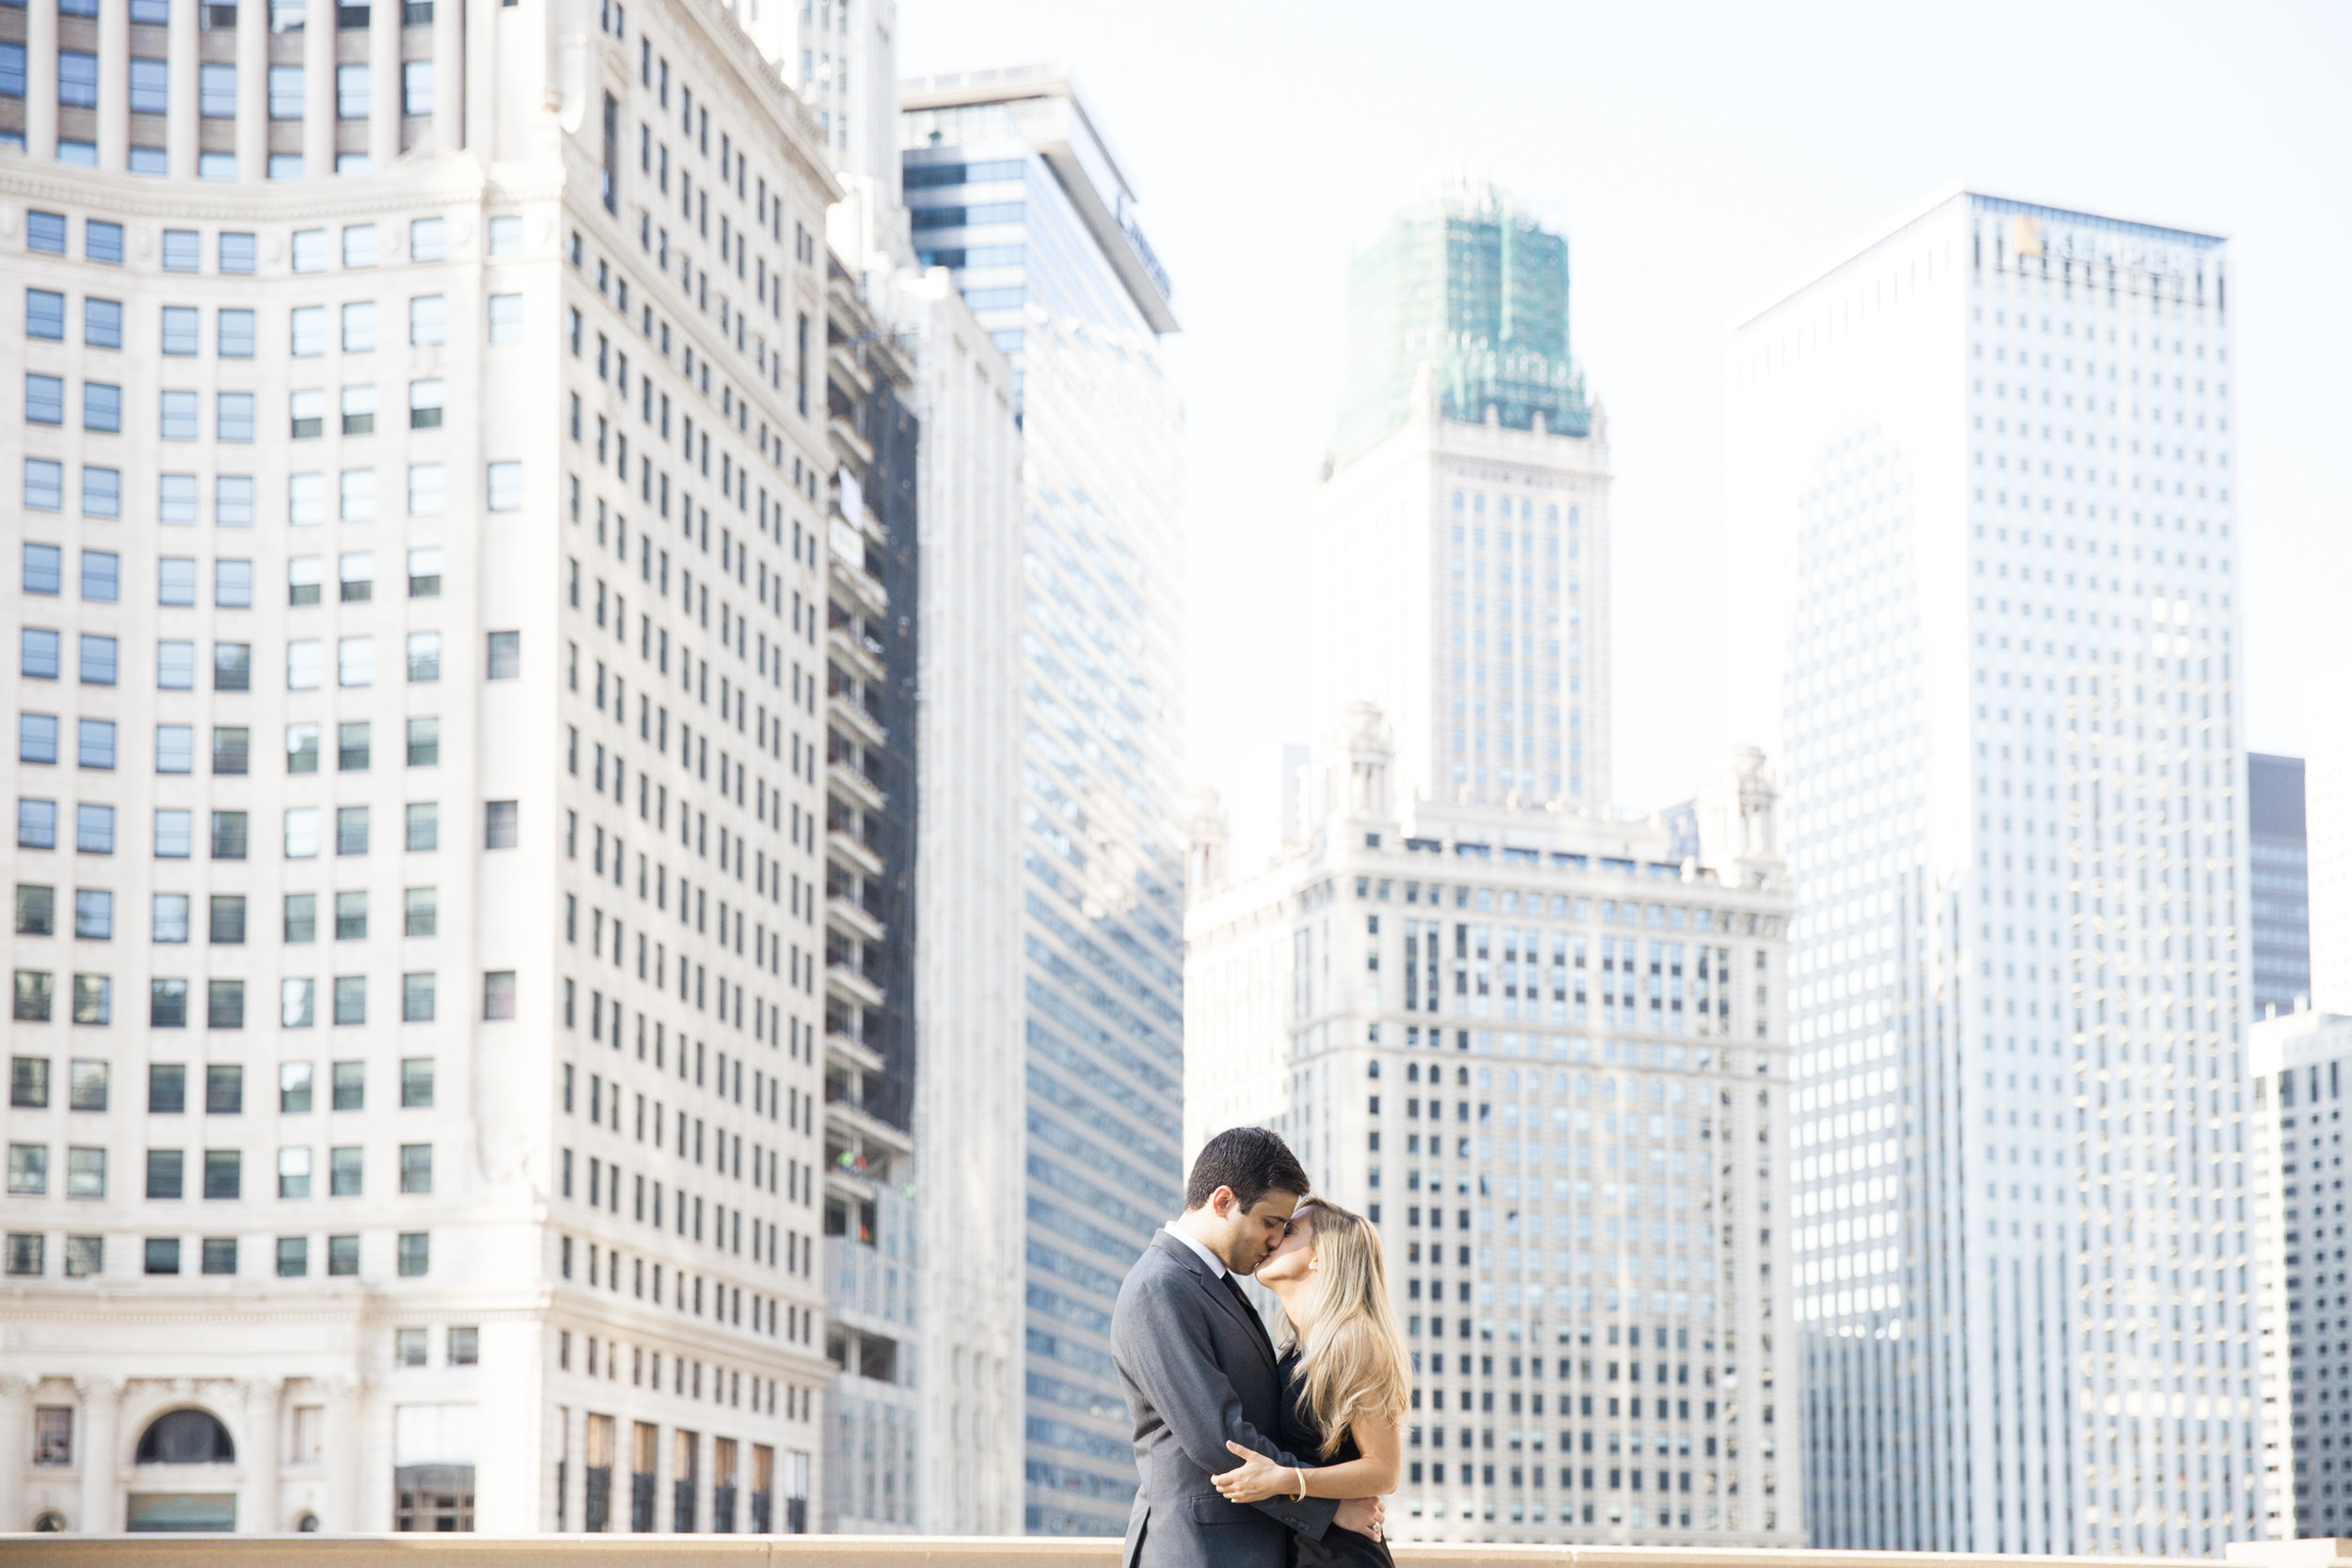 LisaDiederichPhotography_Landon&Ramsey_ChicagoEngagement-12.jpg